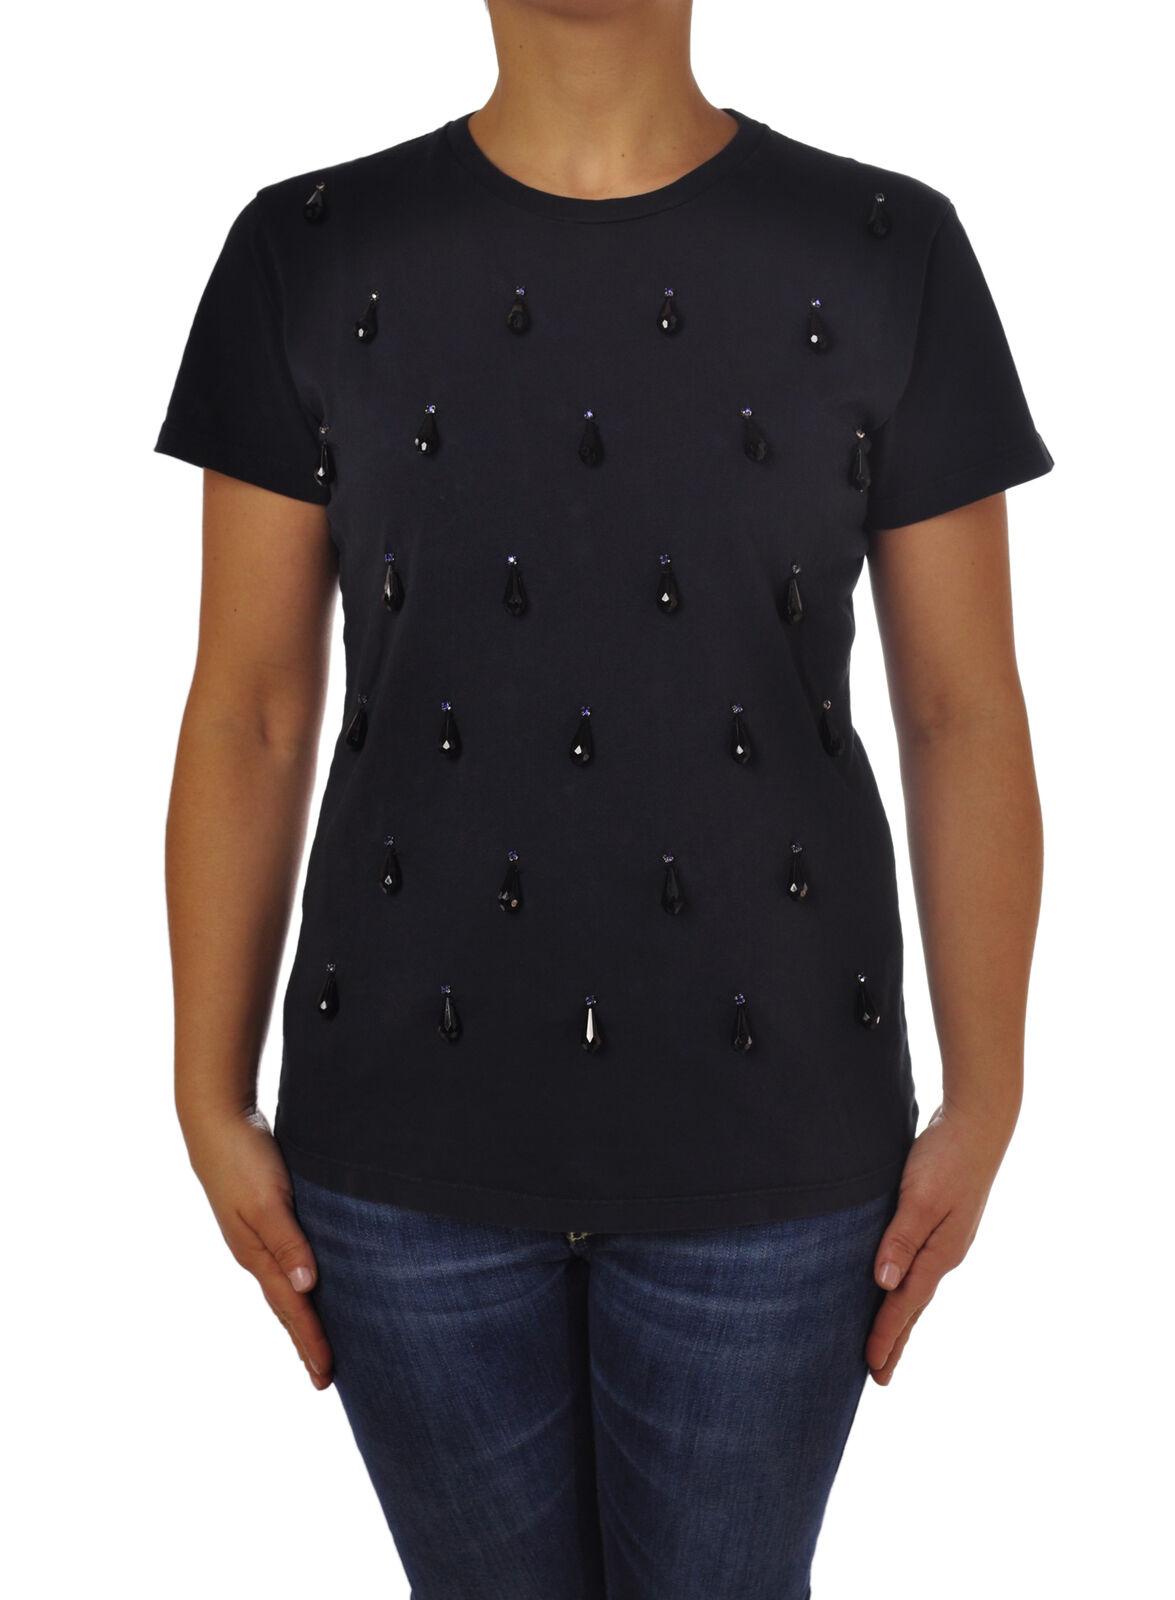 Rosao - Topwear-T-shirts - Woman - Blau - 4777826F184648